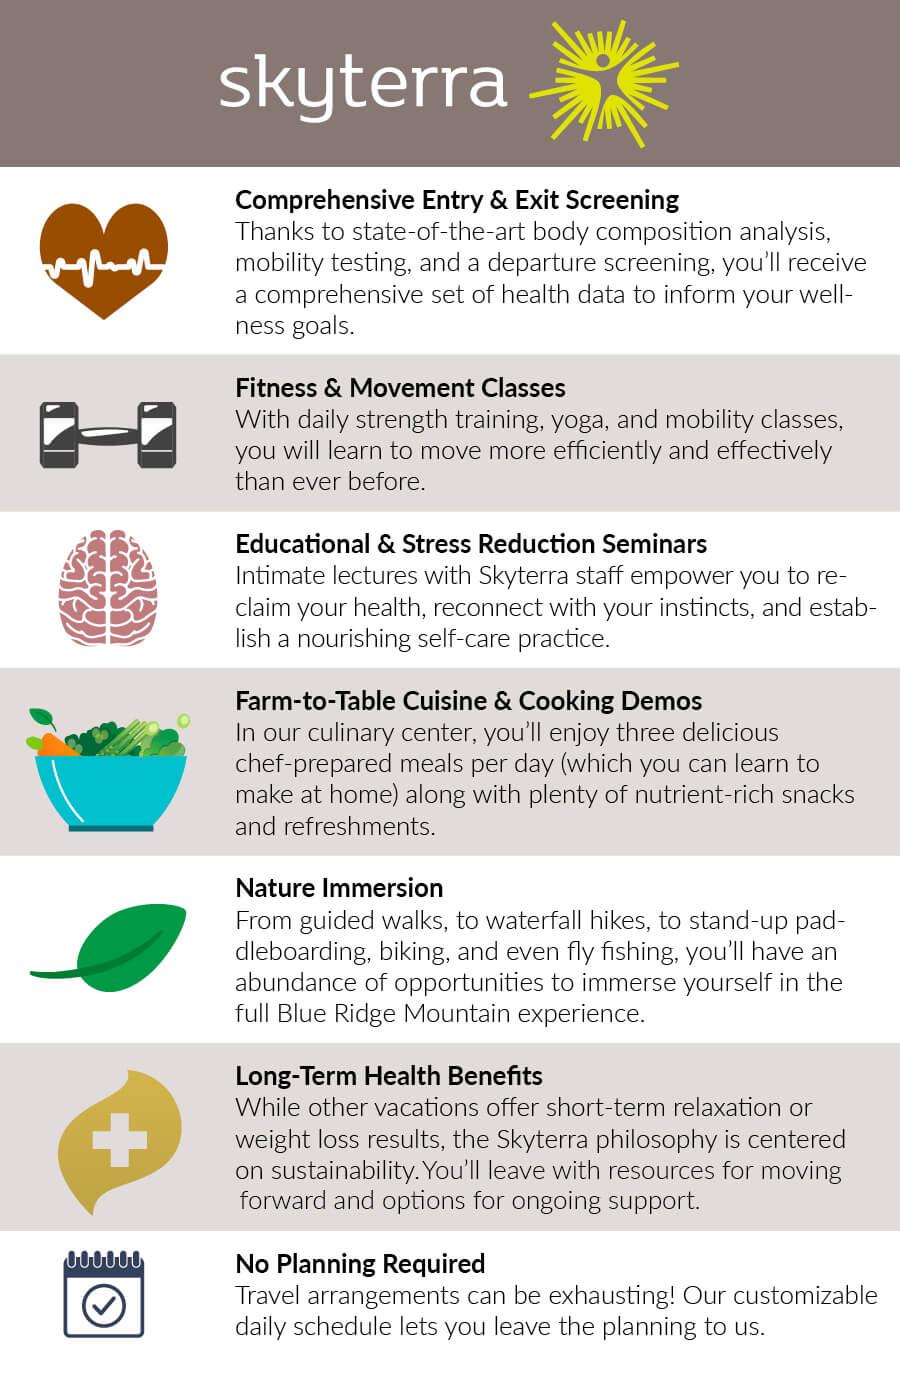 Benefits of Skyterra Wellness Retreat